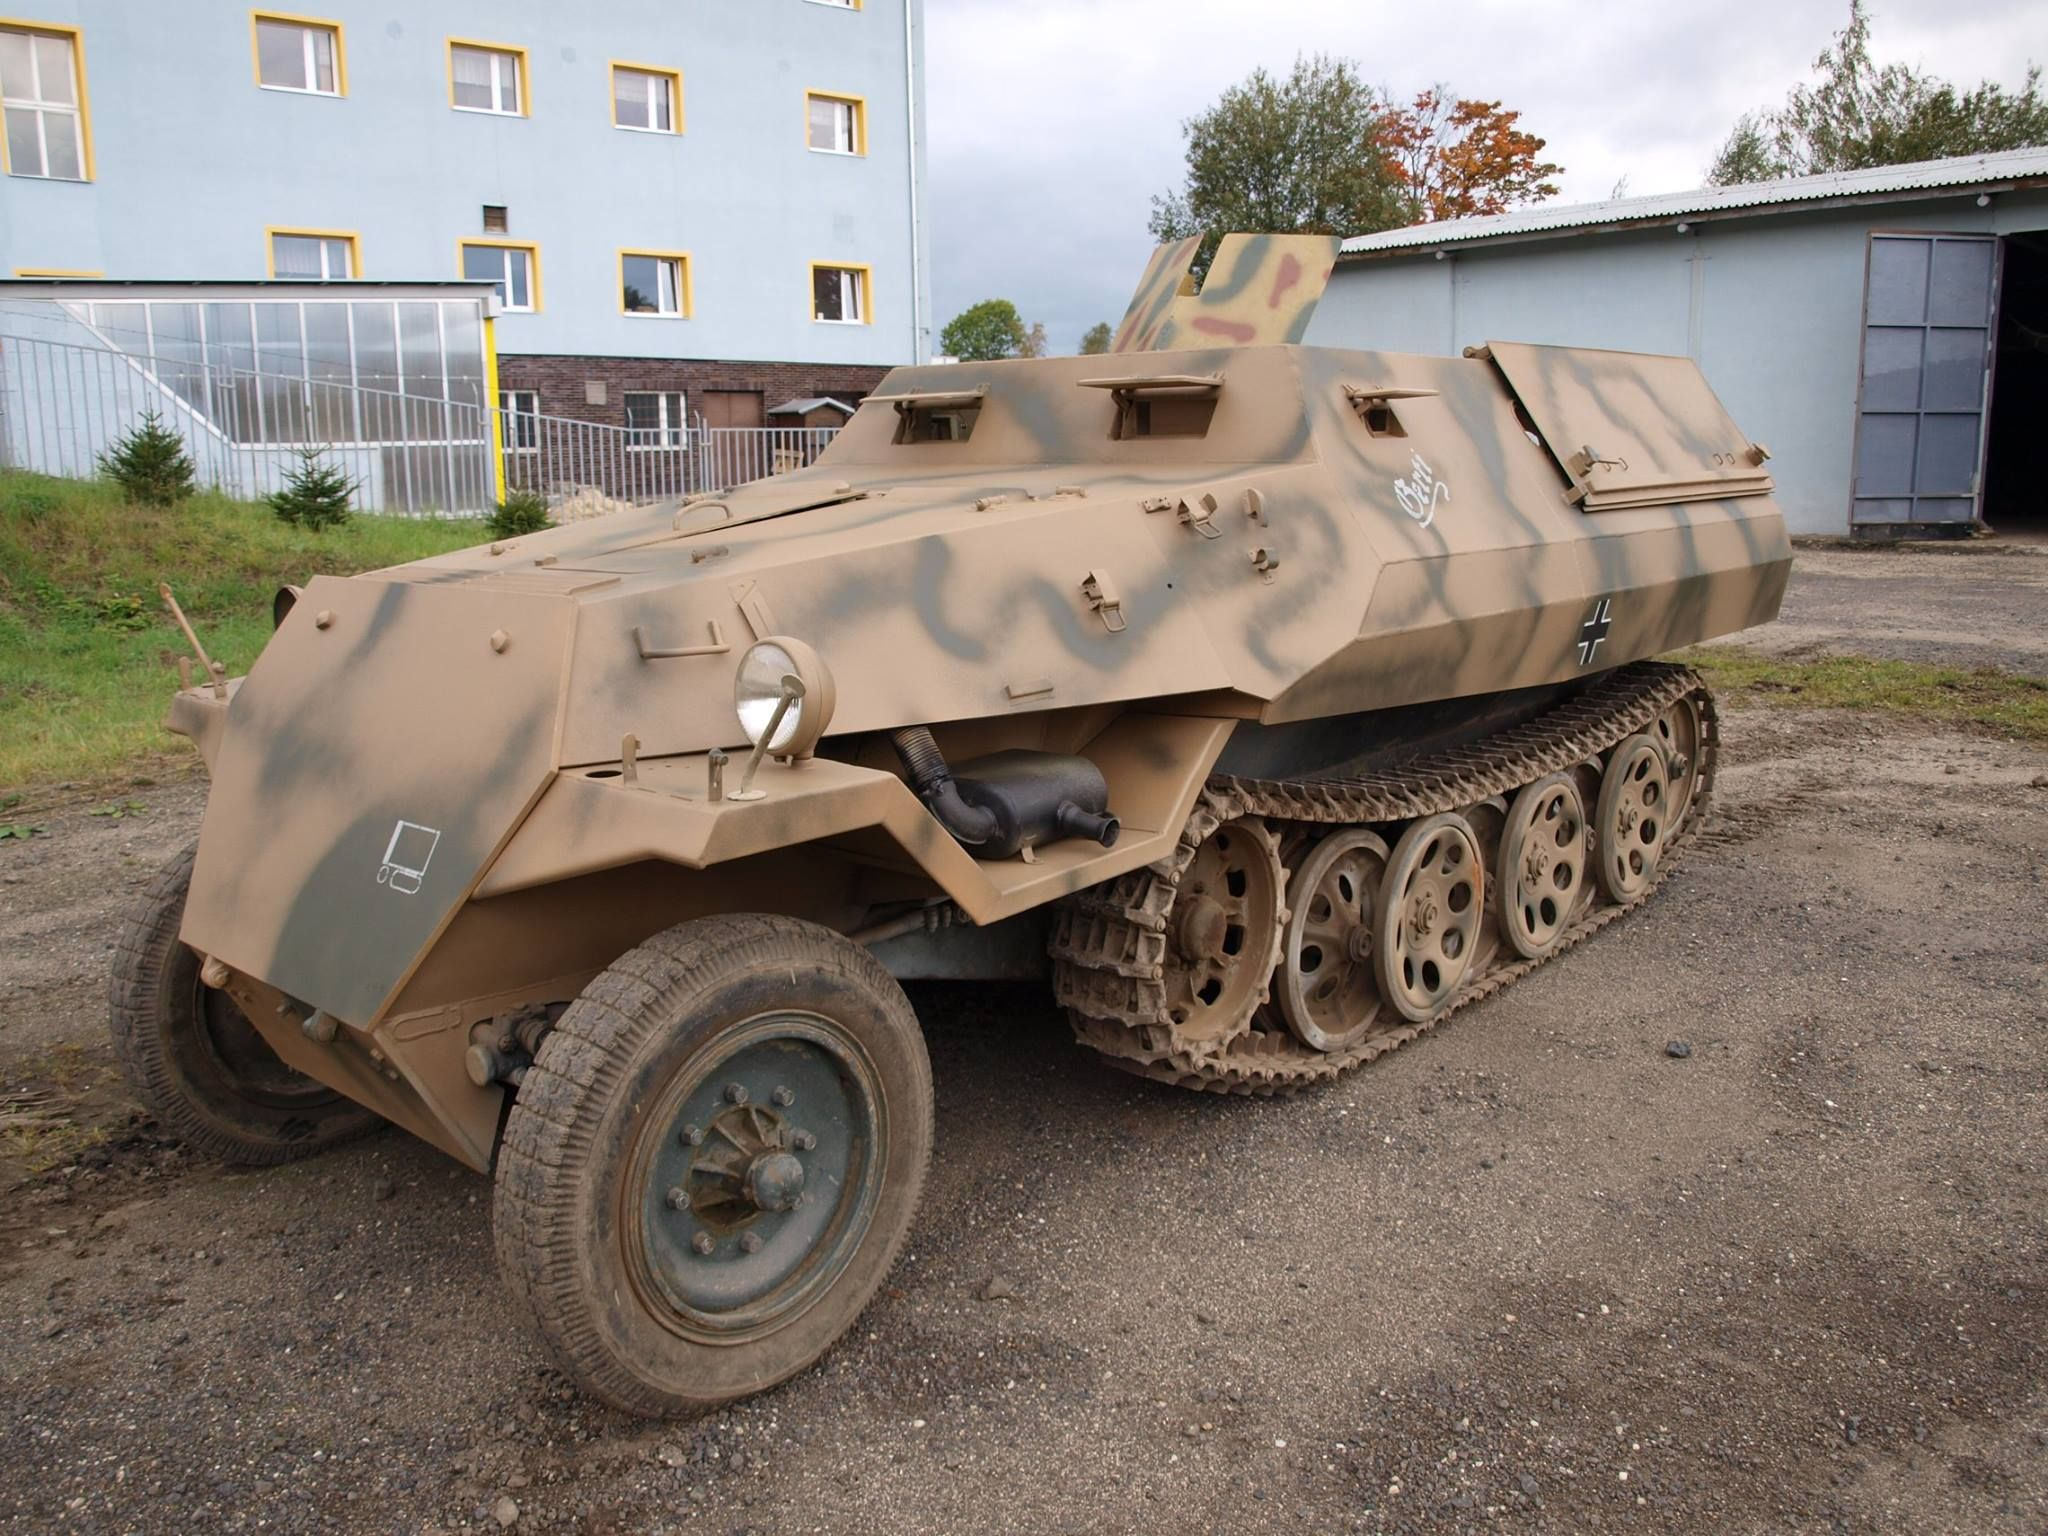 For Sale: SdKfz 251 D Replica - A Re-enactors Dream! | Vehicle ...